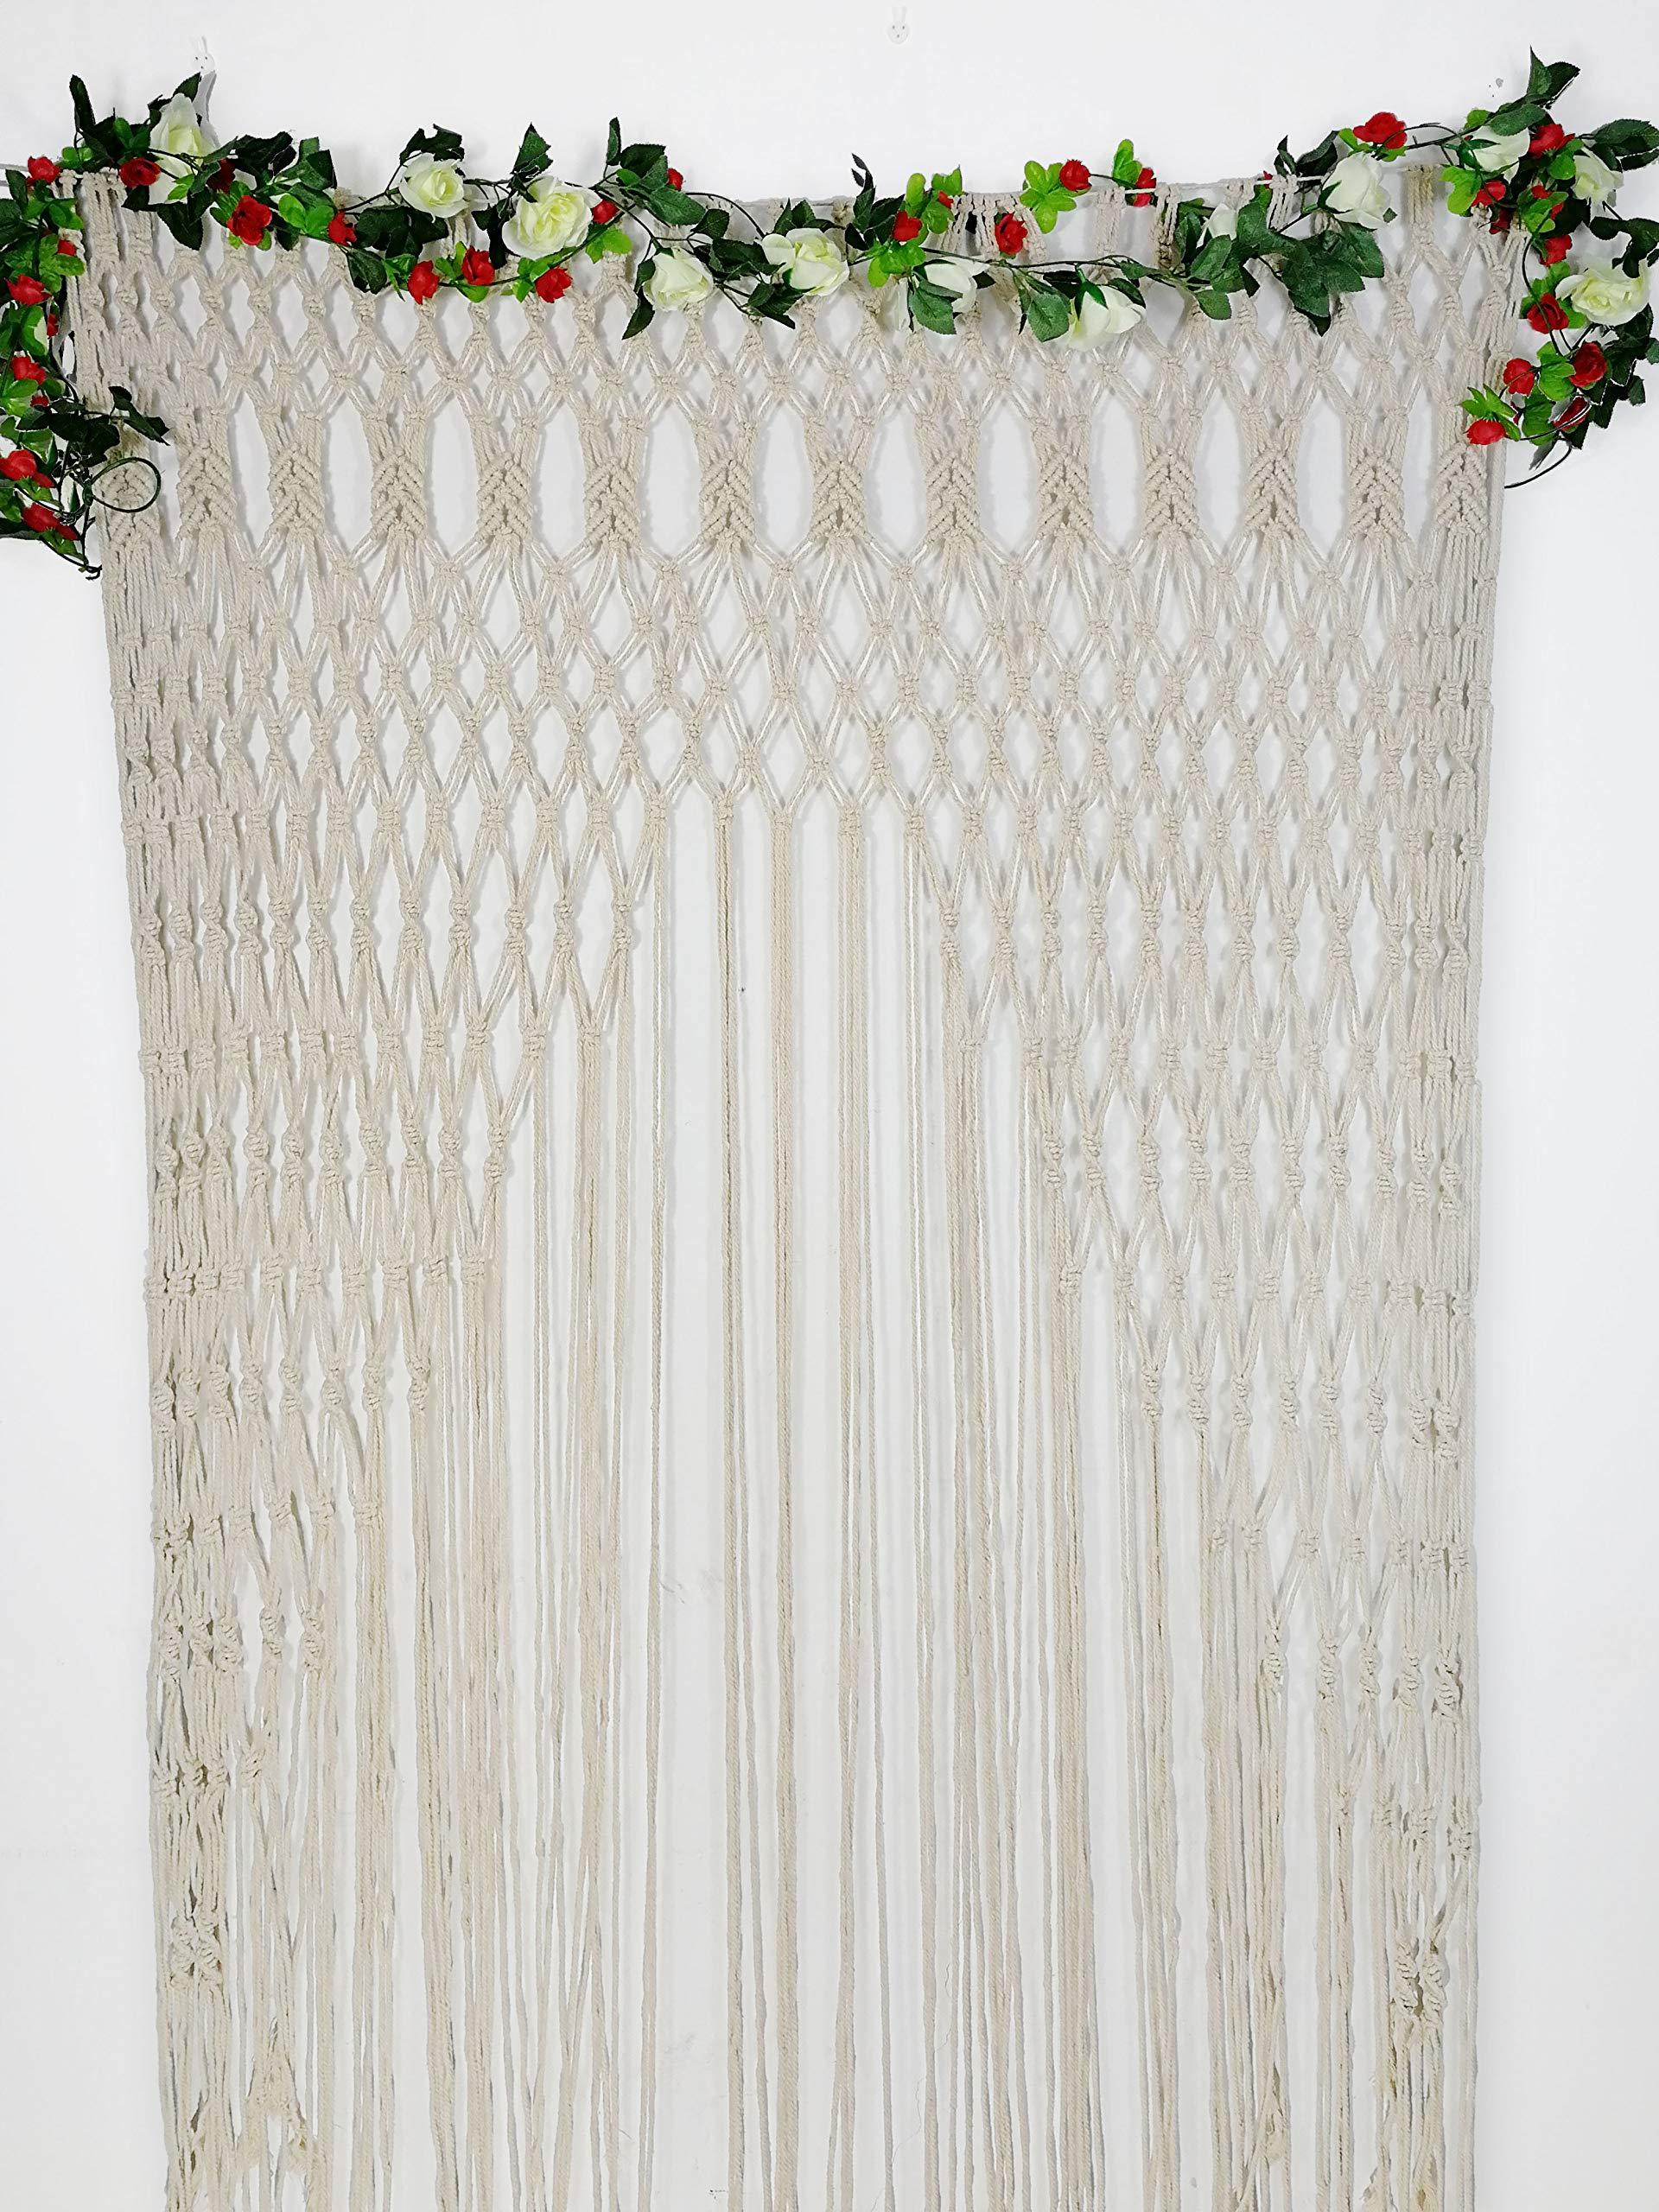 RISEON Large 59''W x 78''L Macrame Wedding Backdrop, Macrame Wedding Arch Arbor, Macrame Wall Hanging,Macrame Door Hanging,Room divider,macrame Curtains,Window Curtain BOHO Wall Art